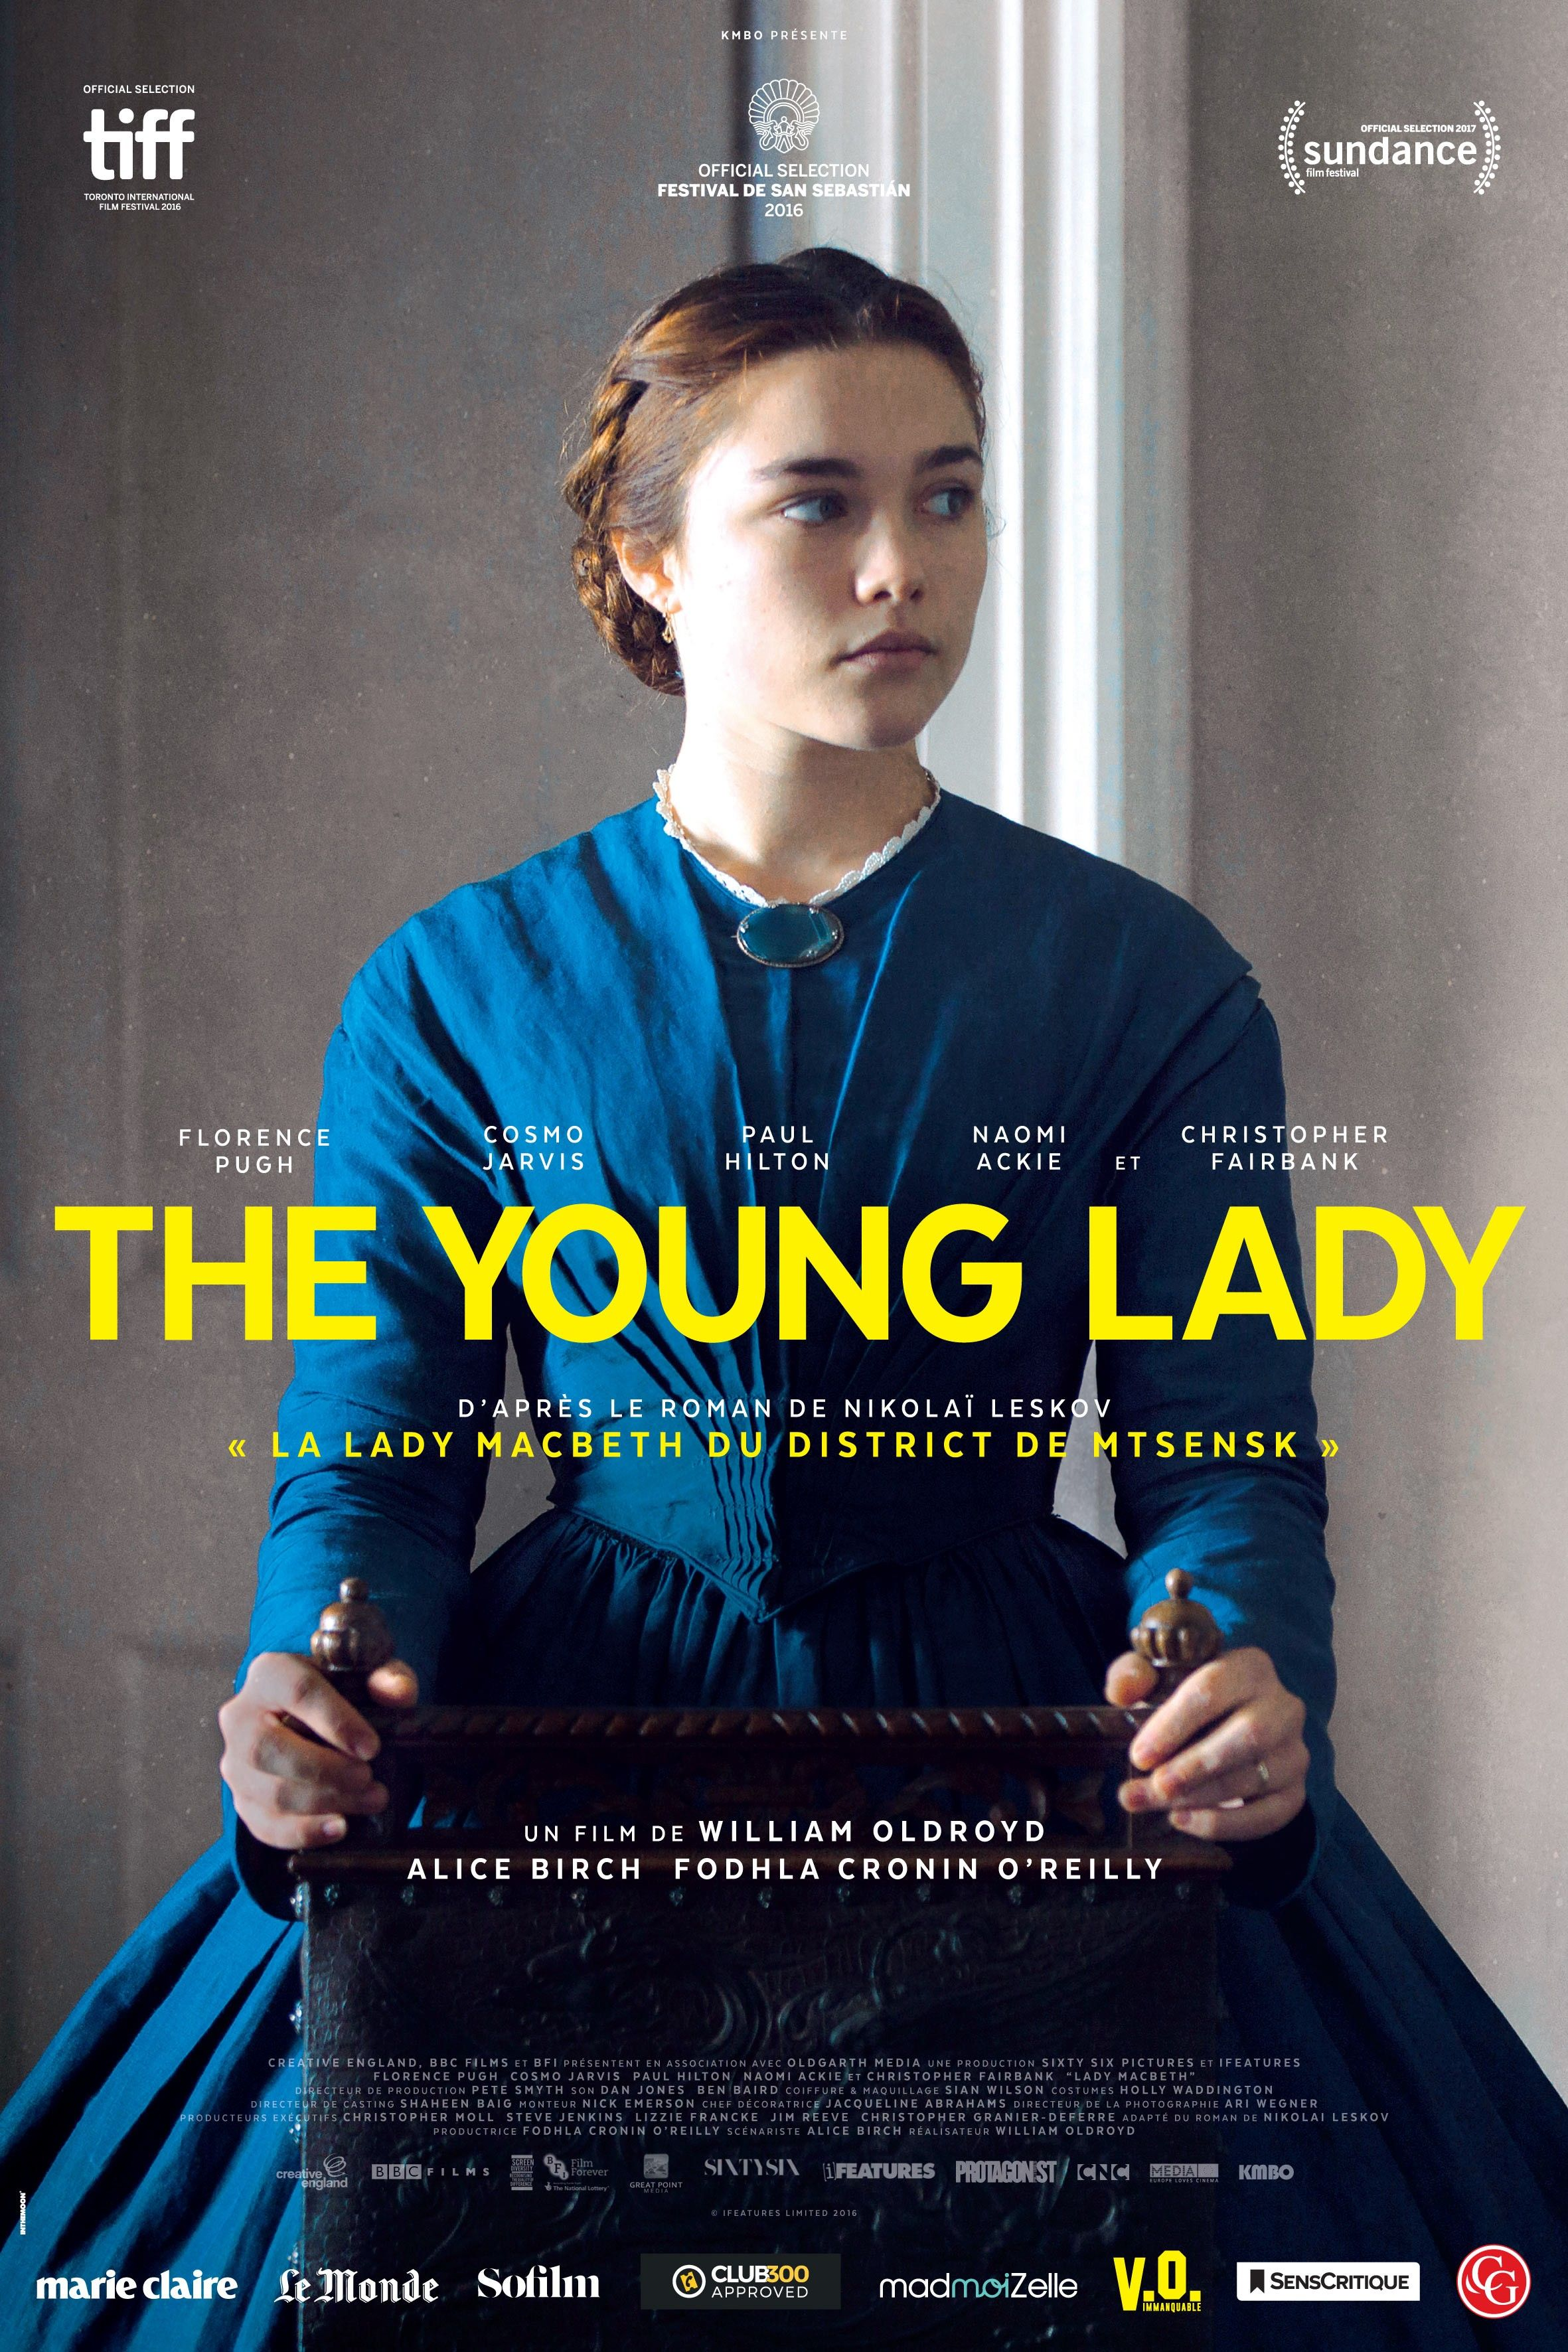 lady macbeth movie poster에 대한 이미지 검색결과